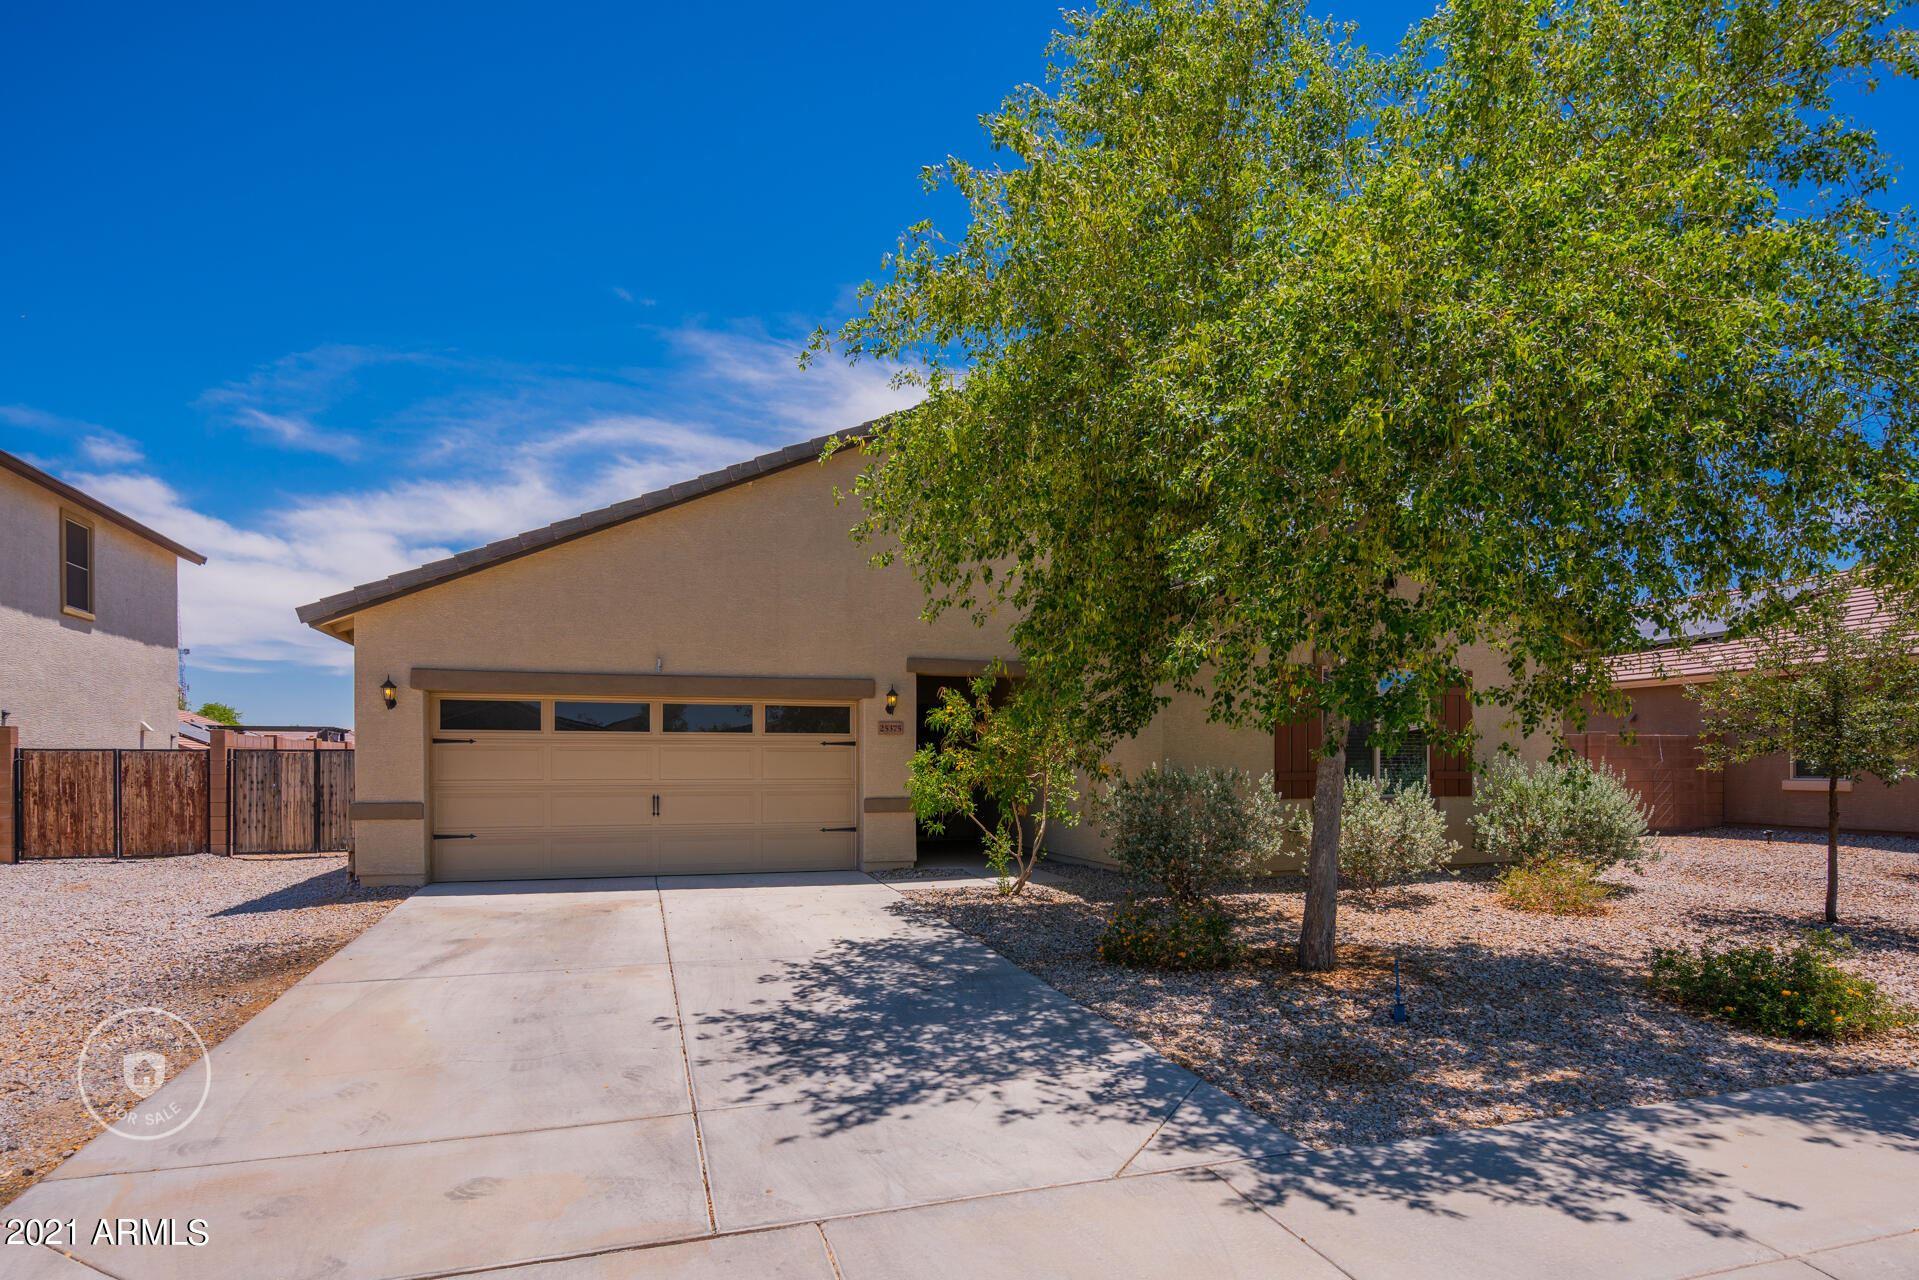 Photo of 25375 W FREMONT Court, Buckeye, AZ 85326 (MLS # 6249477)